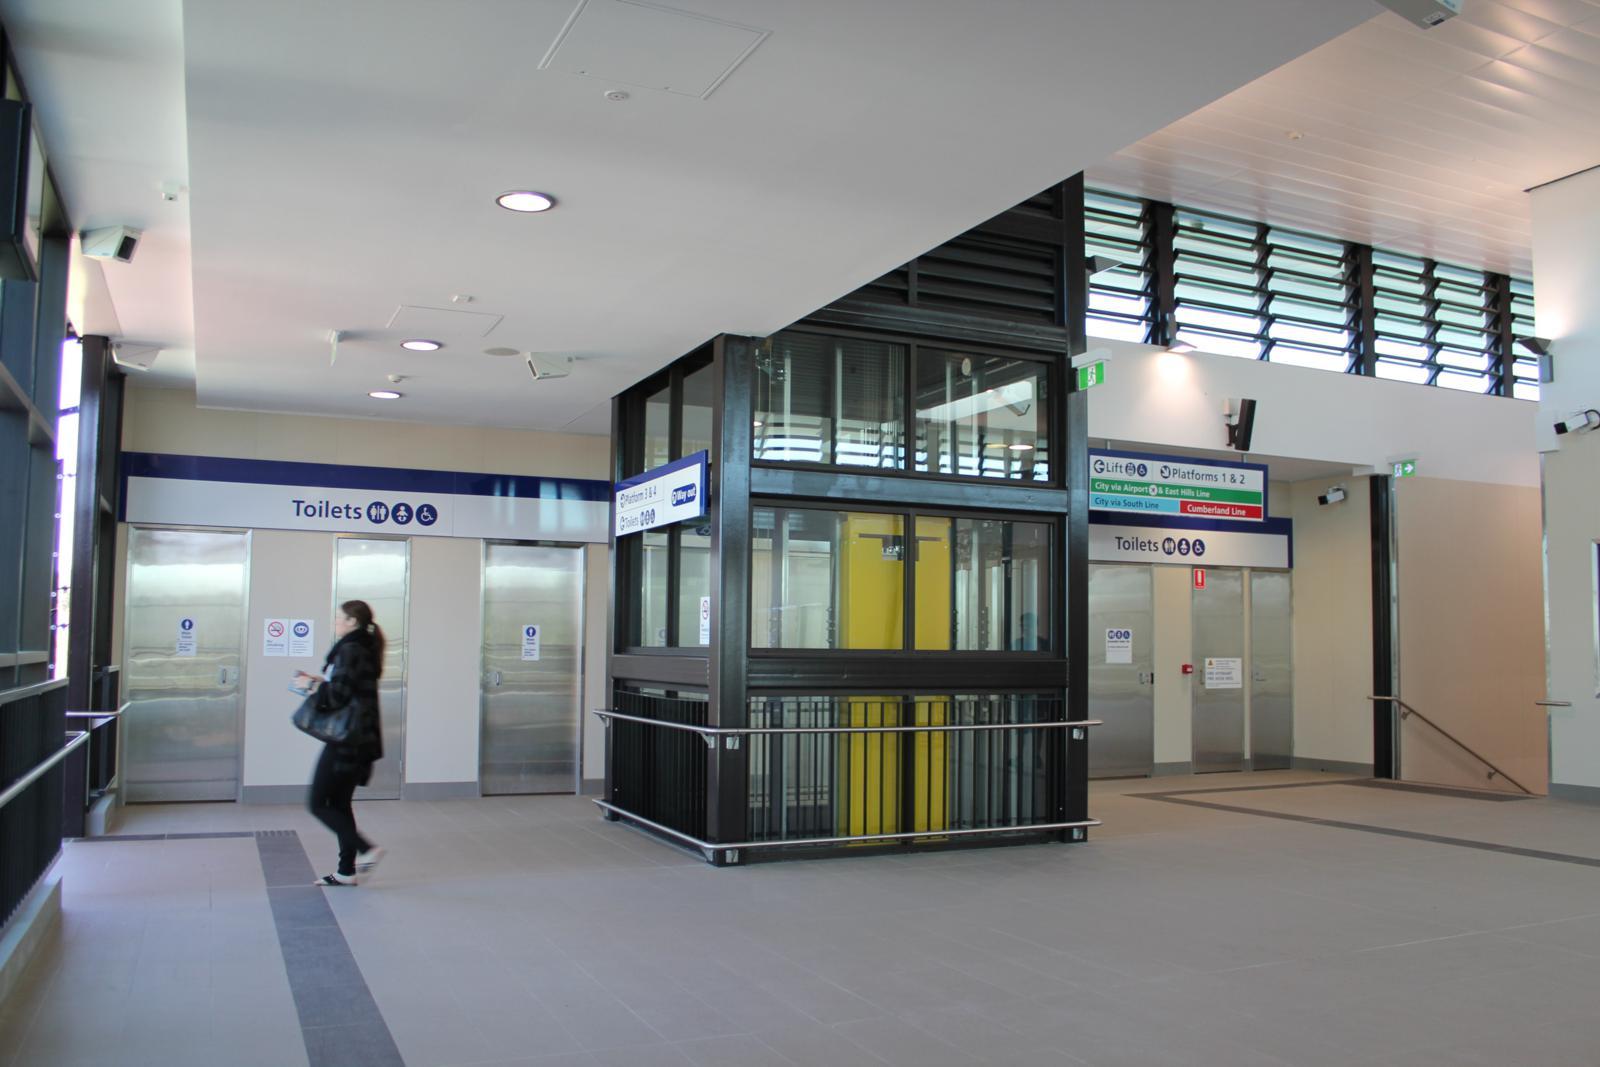 Railways station toilets